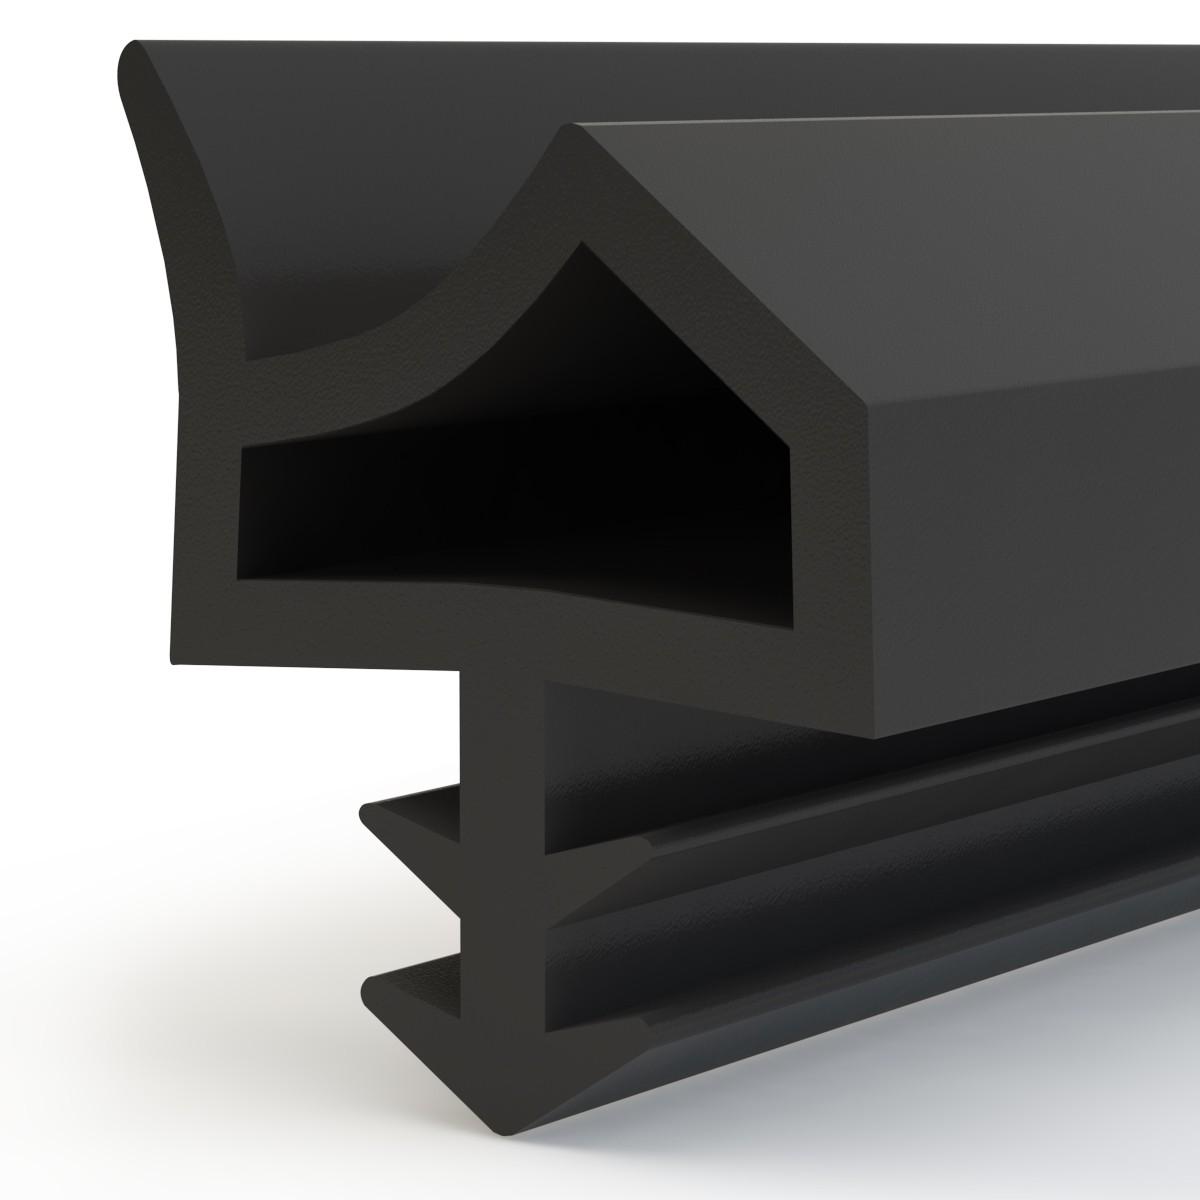 t rdichtung weiss zimmert rdichtung holzzarge jumbo shop superg nstiger online baumarkt f r. Black Bedroom Furniture Sets. Home Design Ideas